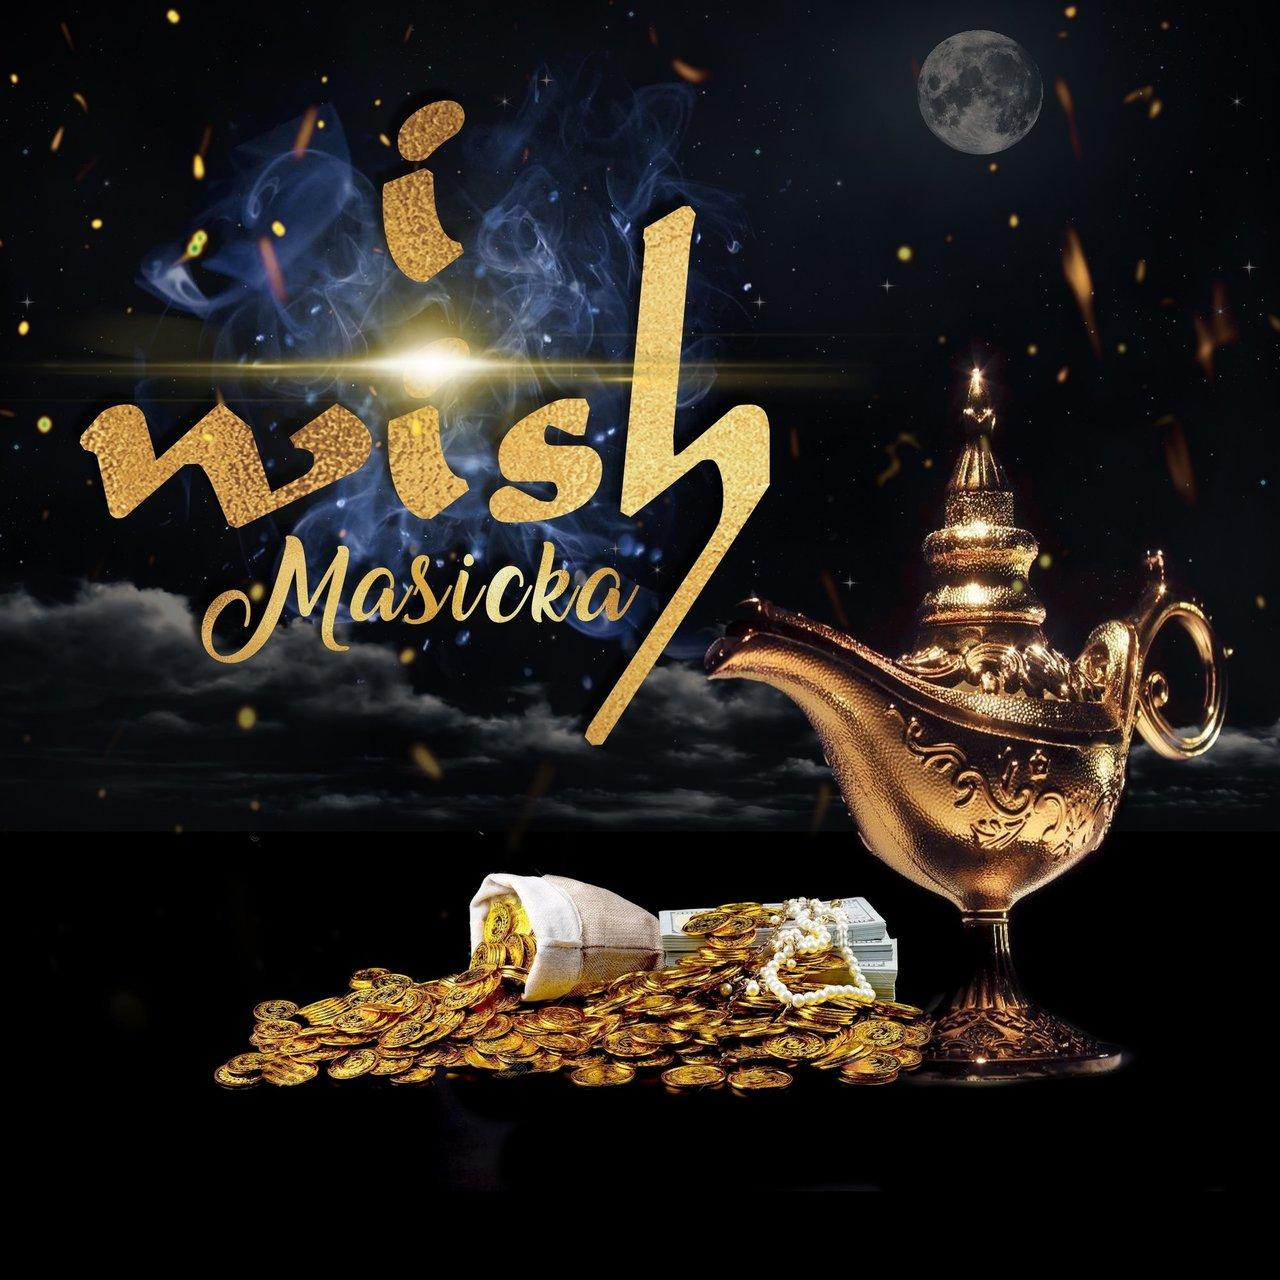 Masicka - I Wish (Cover)